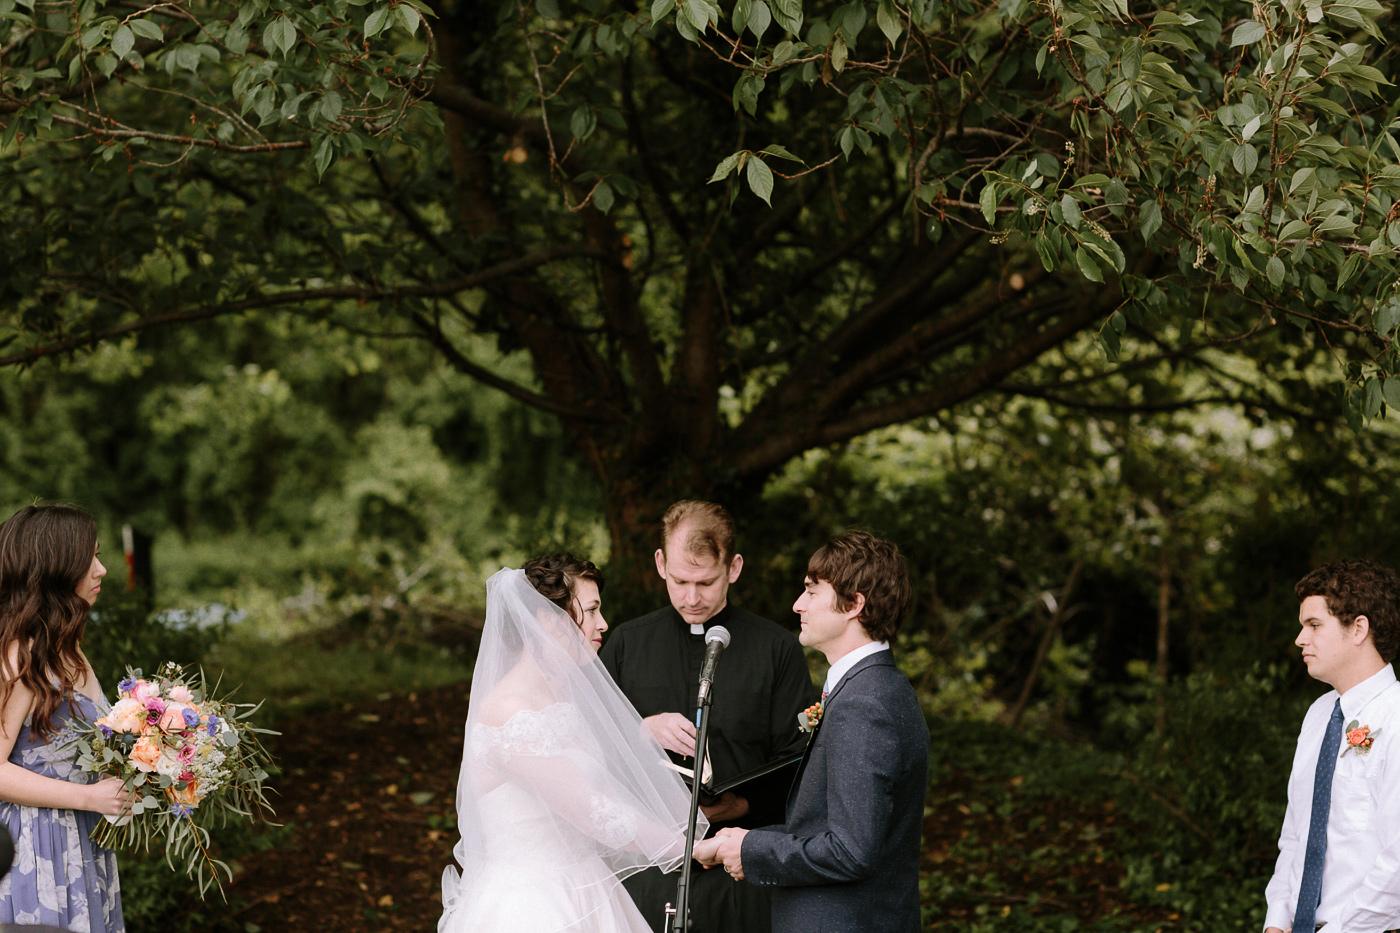 Bride and groom backyard wedding ceremony